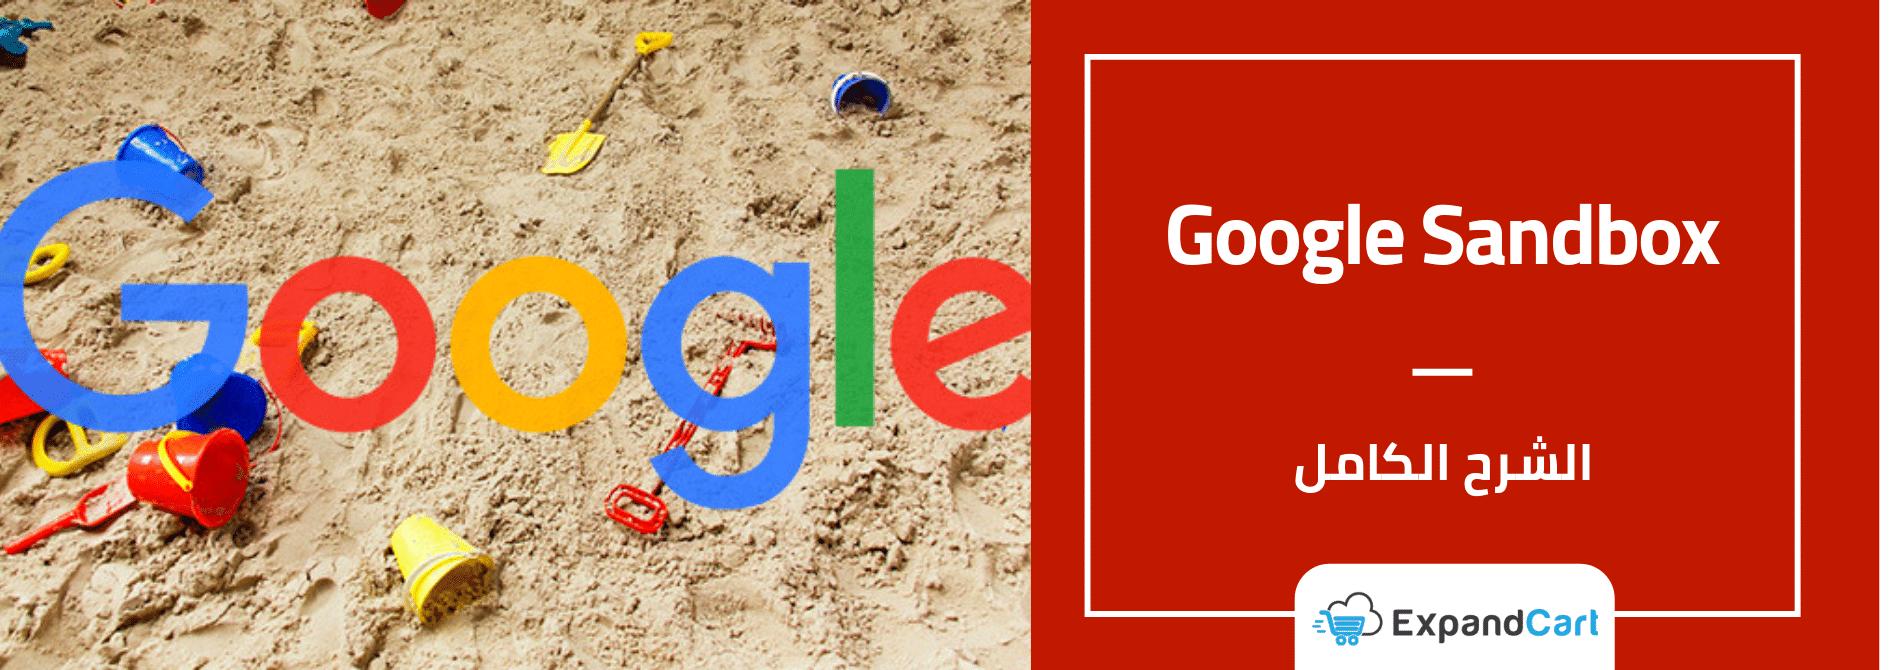 جوجل ساند بوكس Google Sandbox